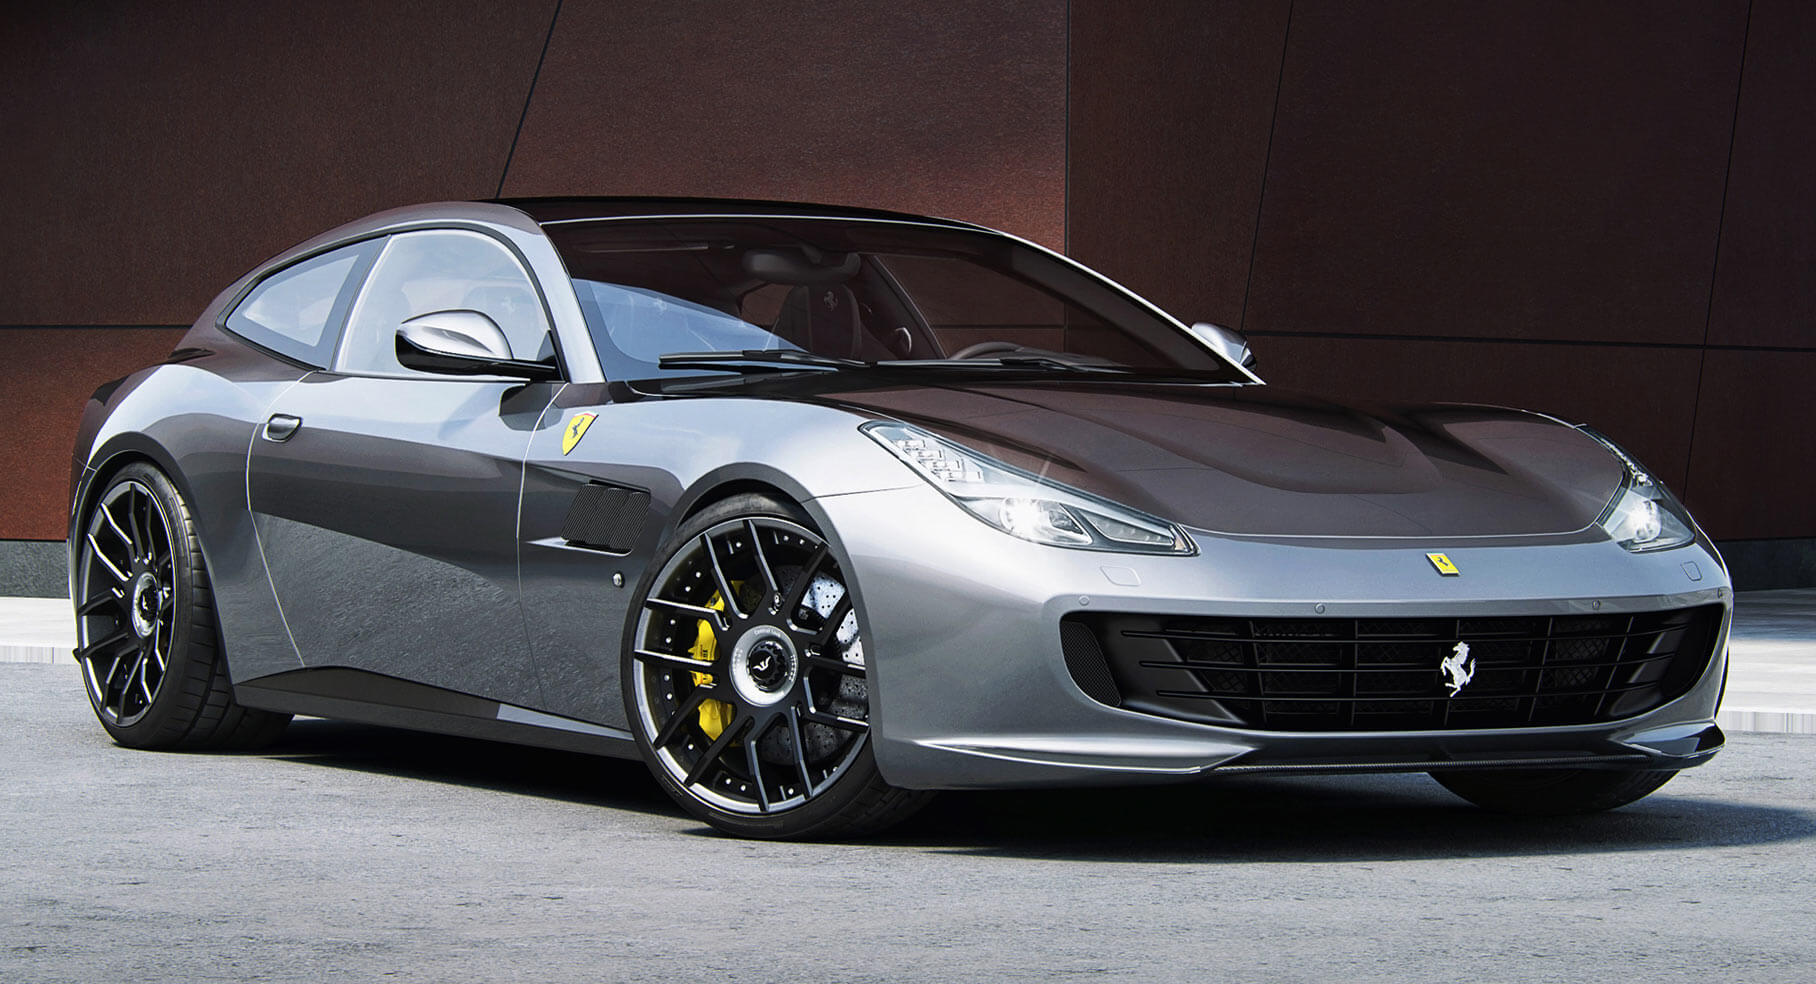 Box Stock Project >> Wheelsandmore's Ferrari GTC4Lusso T Packs More Grunt Than ...